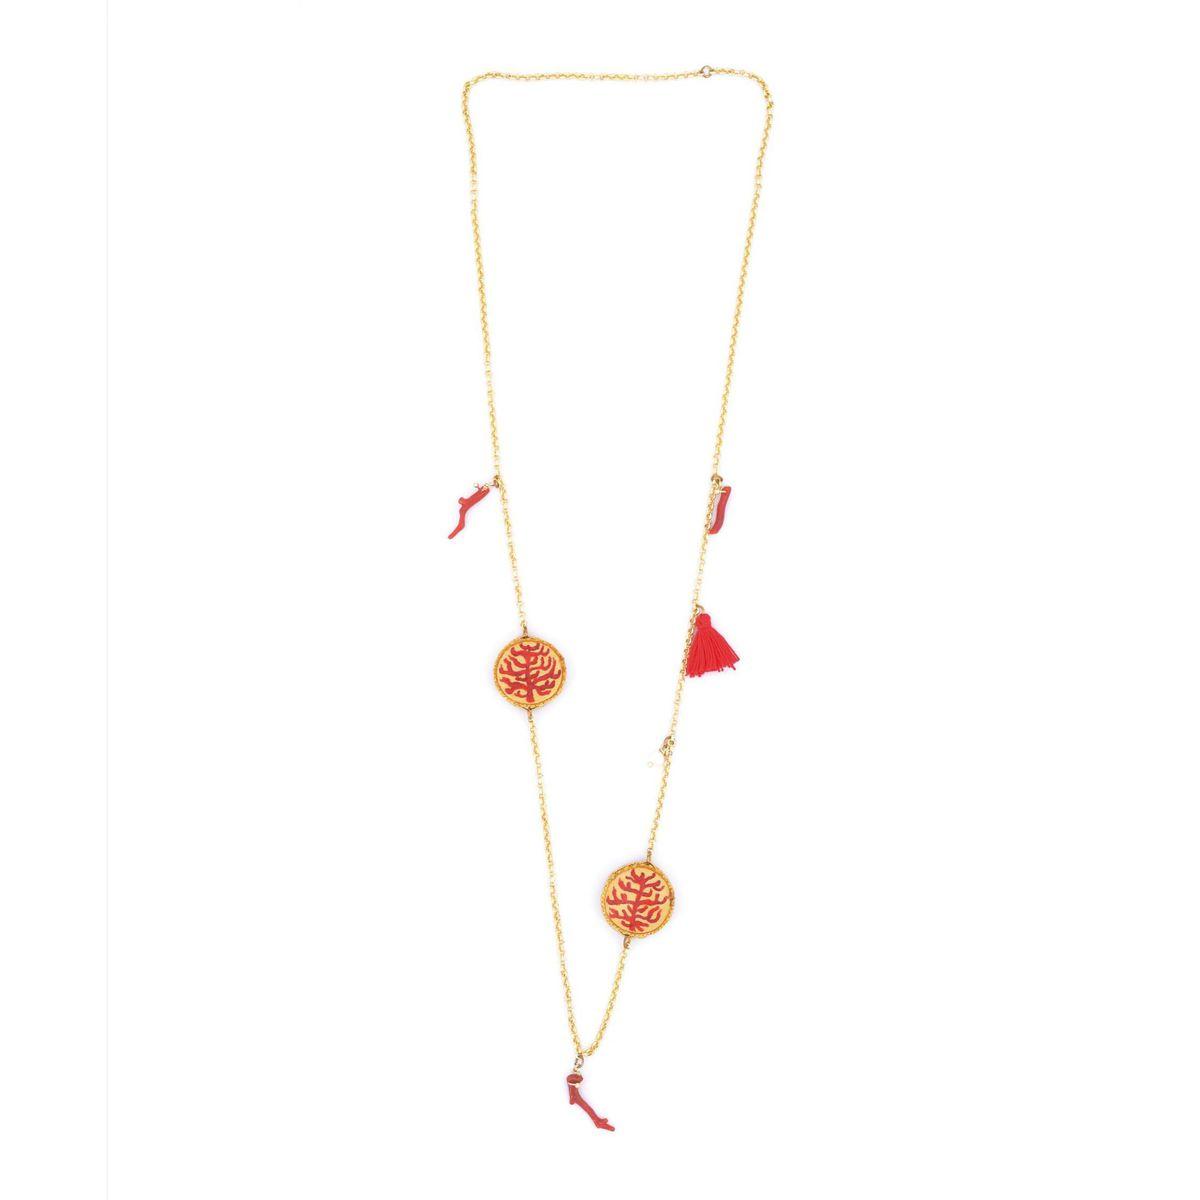 Chanel Tambourine Coral Necklace 18 mm Red Tataratà Bijoux